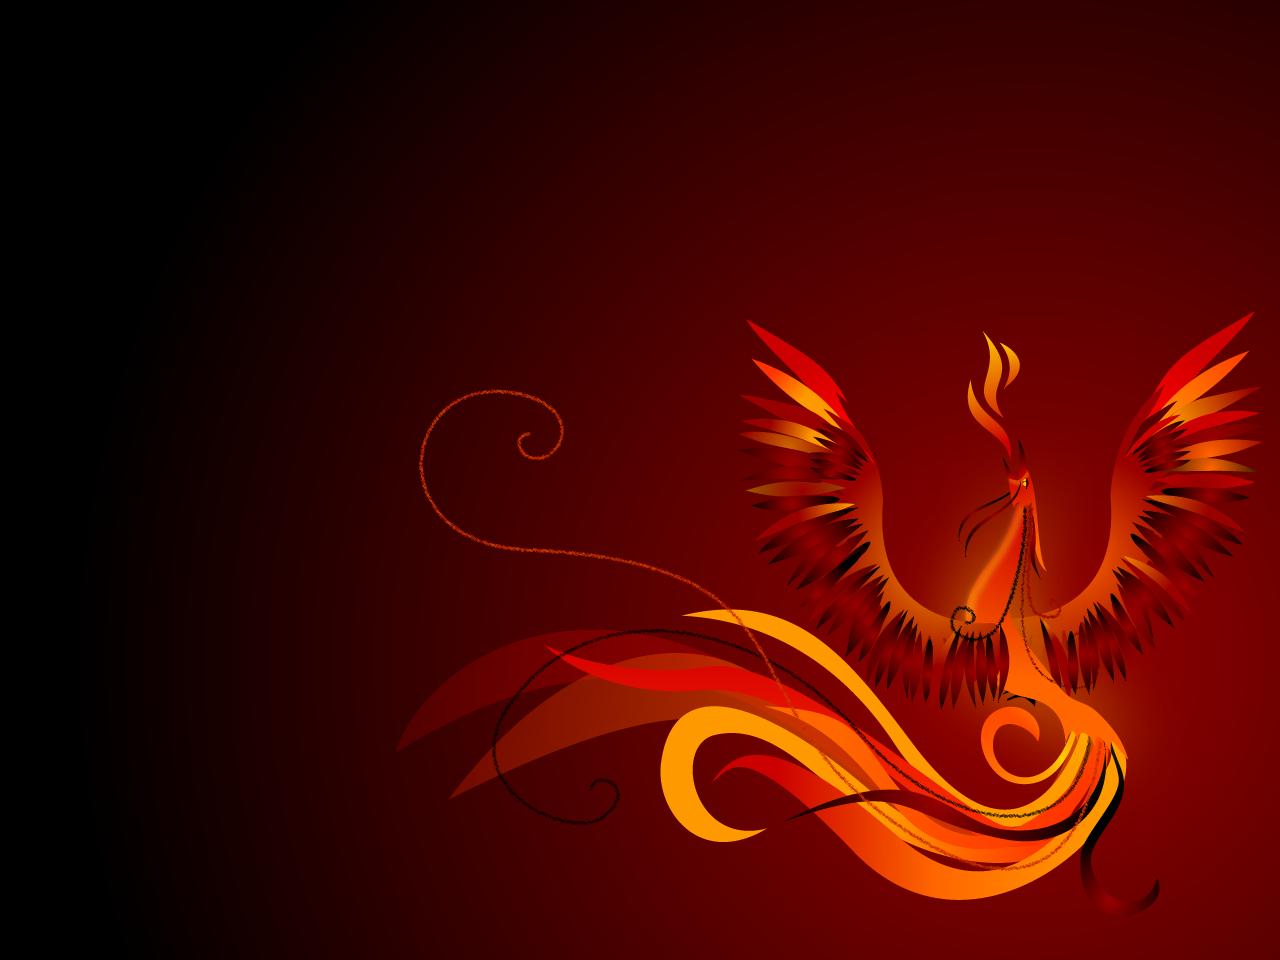 41 phoenix bird hd wallpaper on wallpapersafari - Fenix bird hd images ...